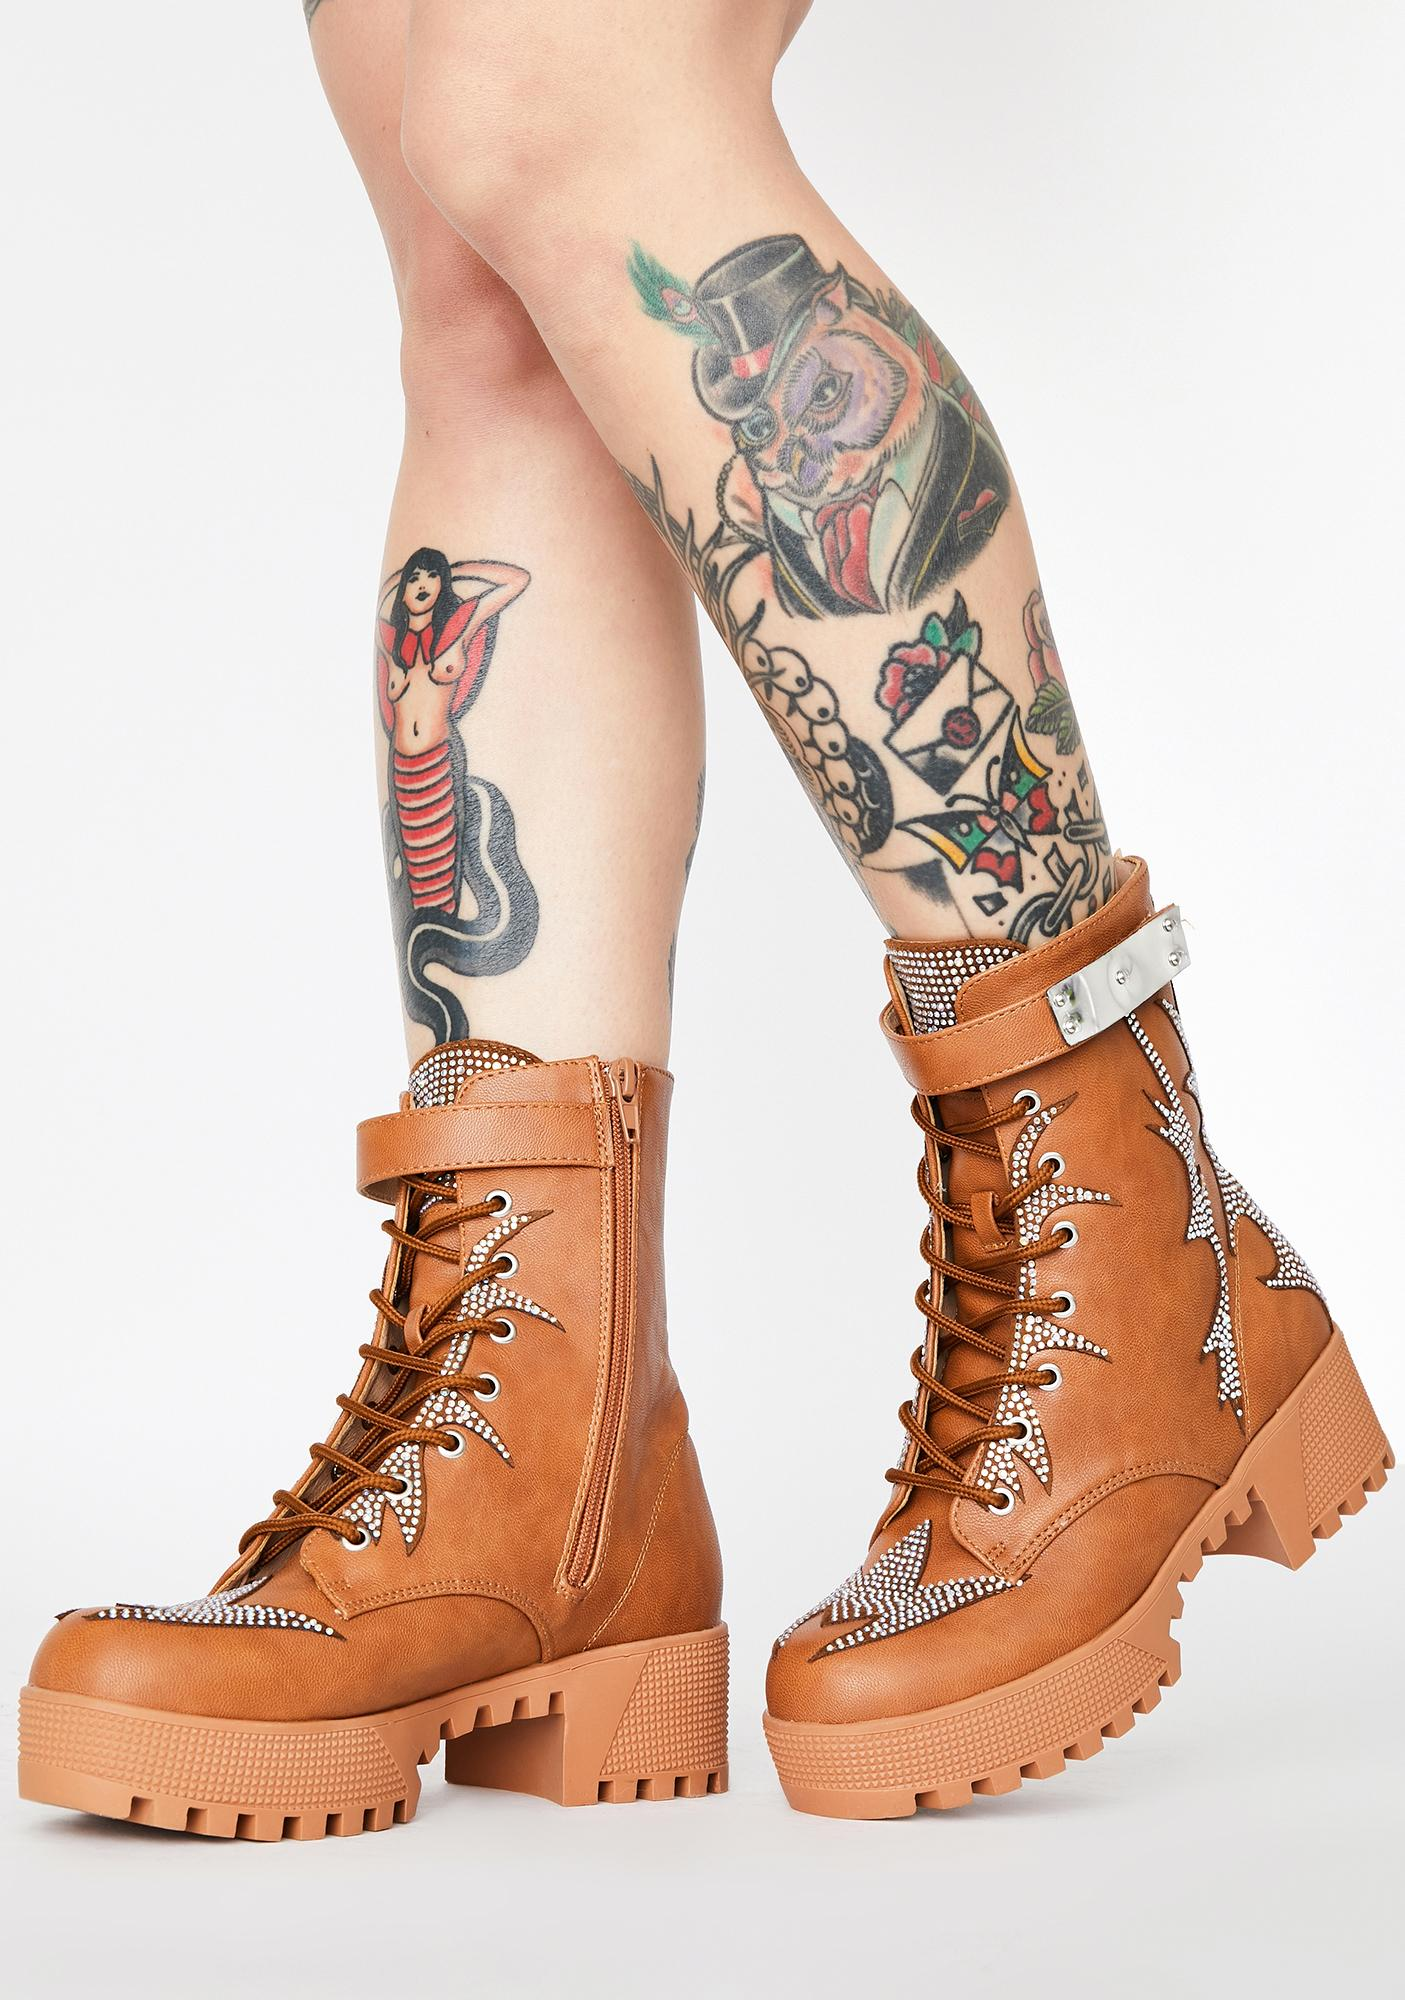 Beach Bling Squad Rhinestone Boots